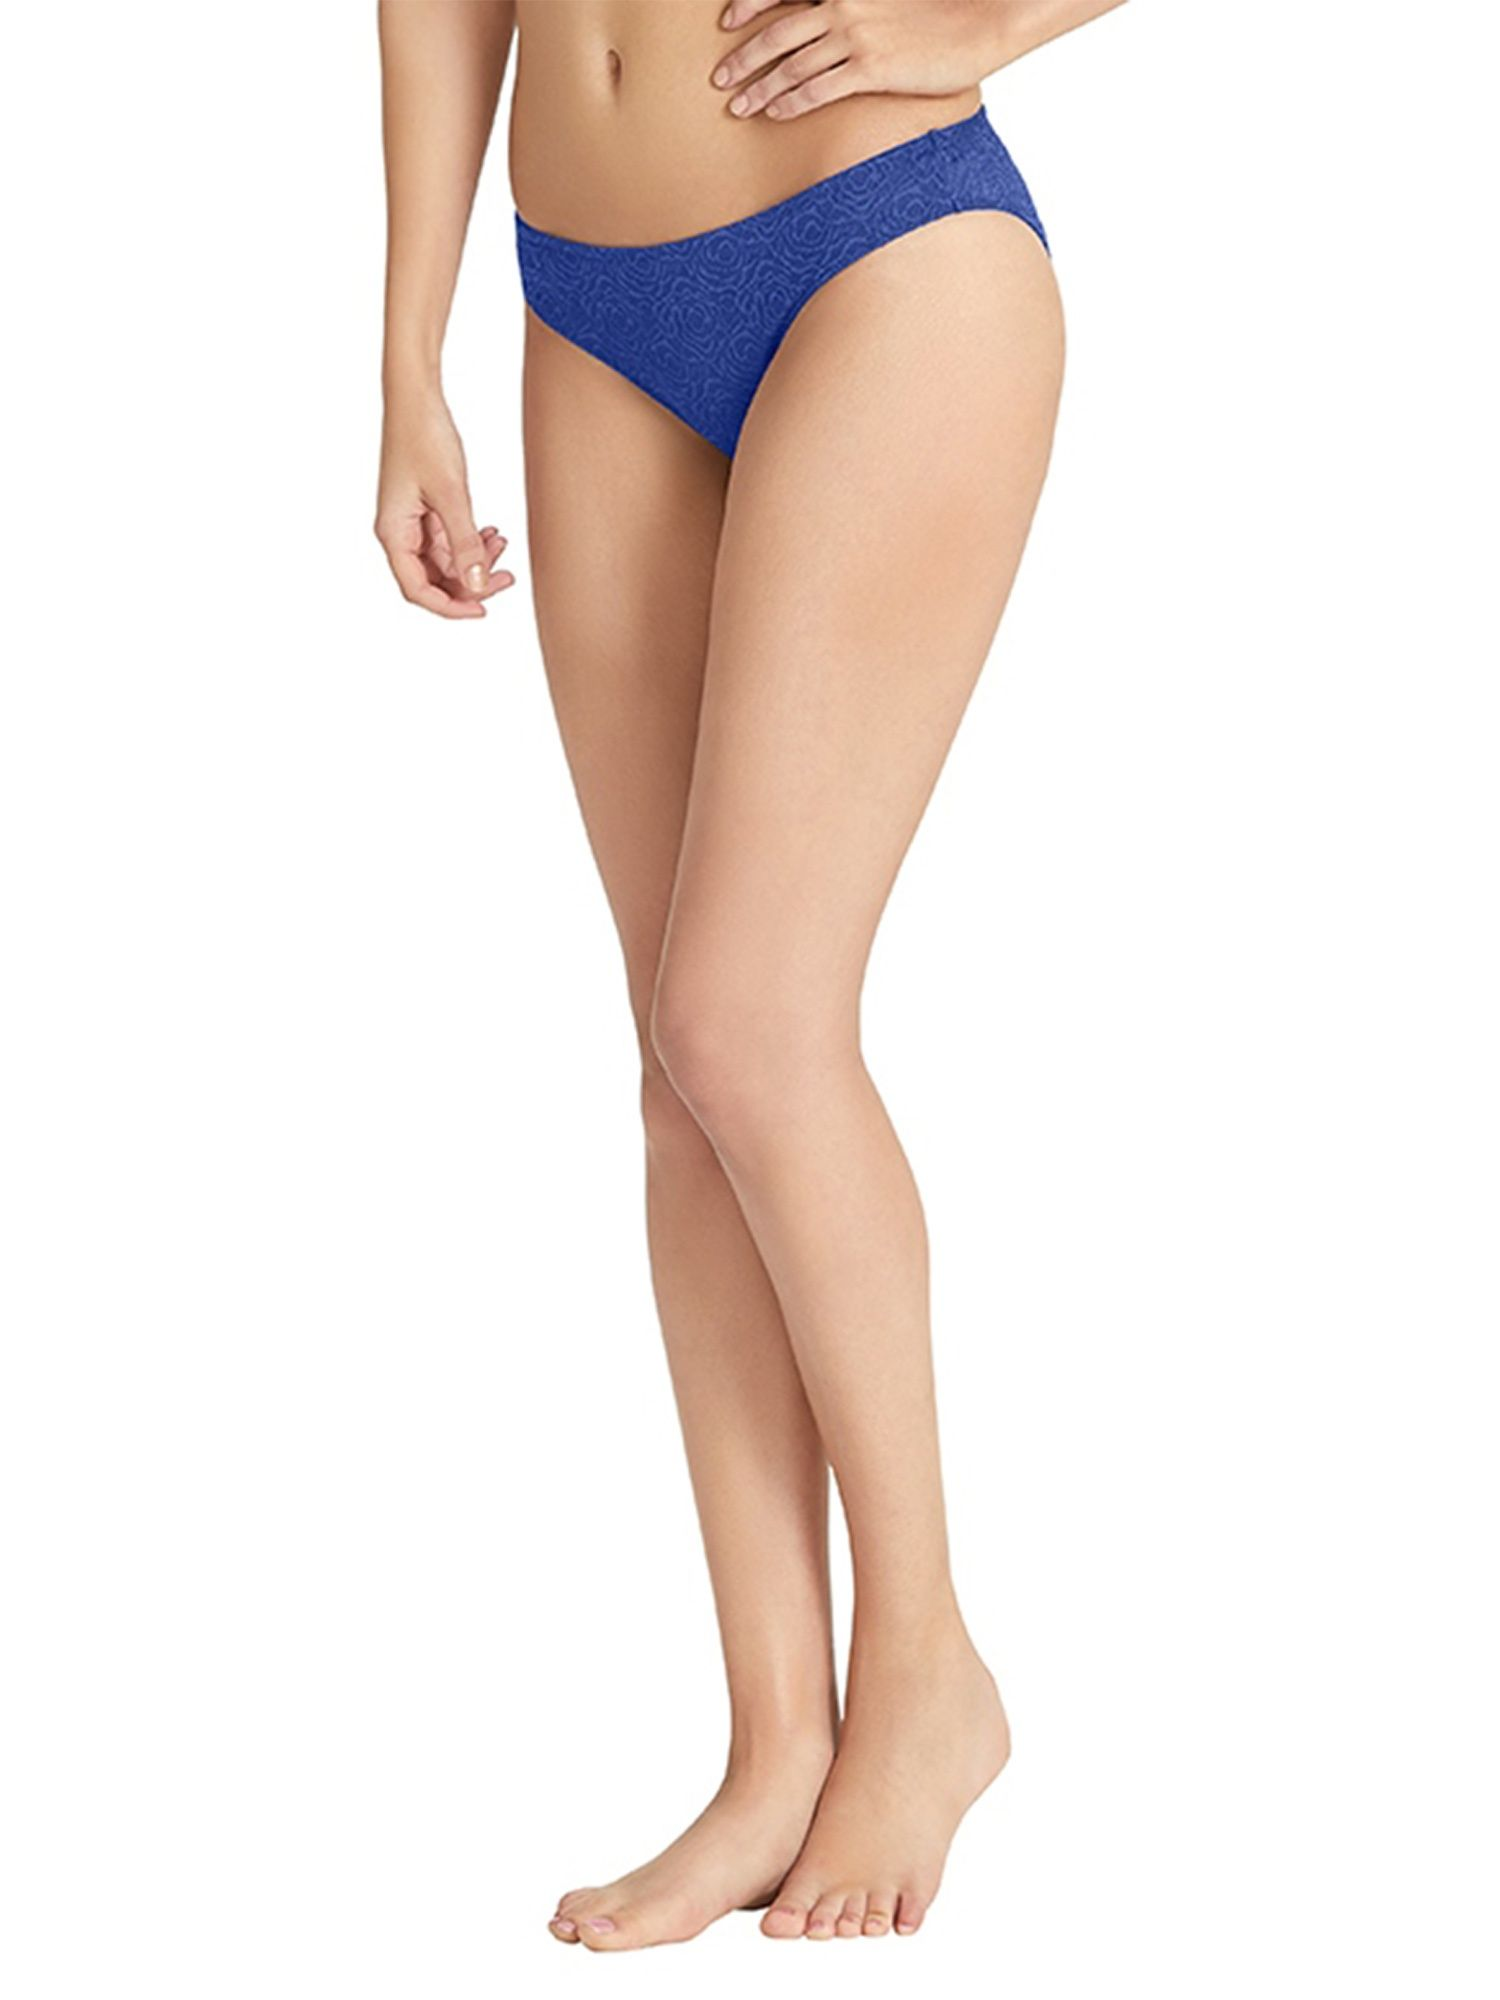 0fd054b7053c Amante Panty : Buy Amante Smooth Romance Low-Rise Bikini - Blue ...